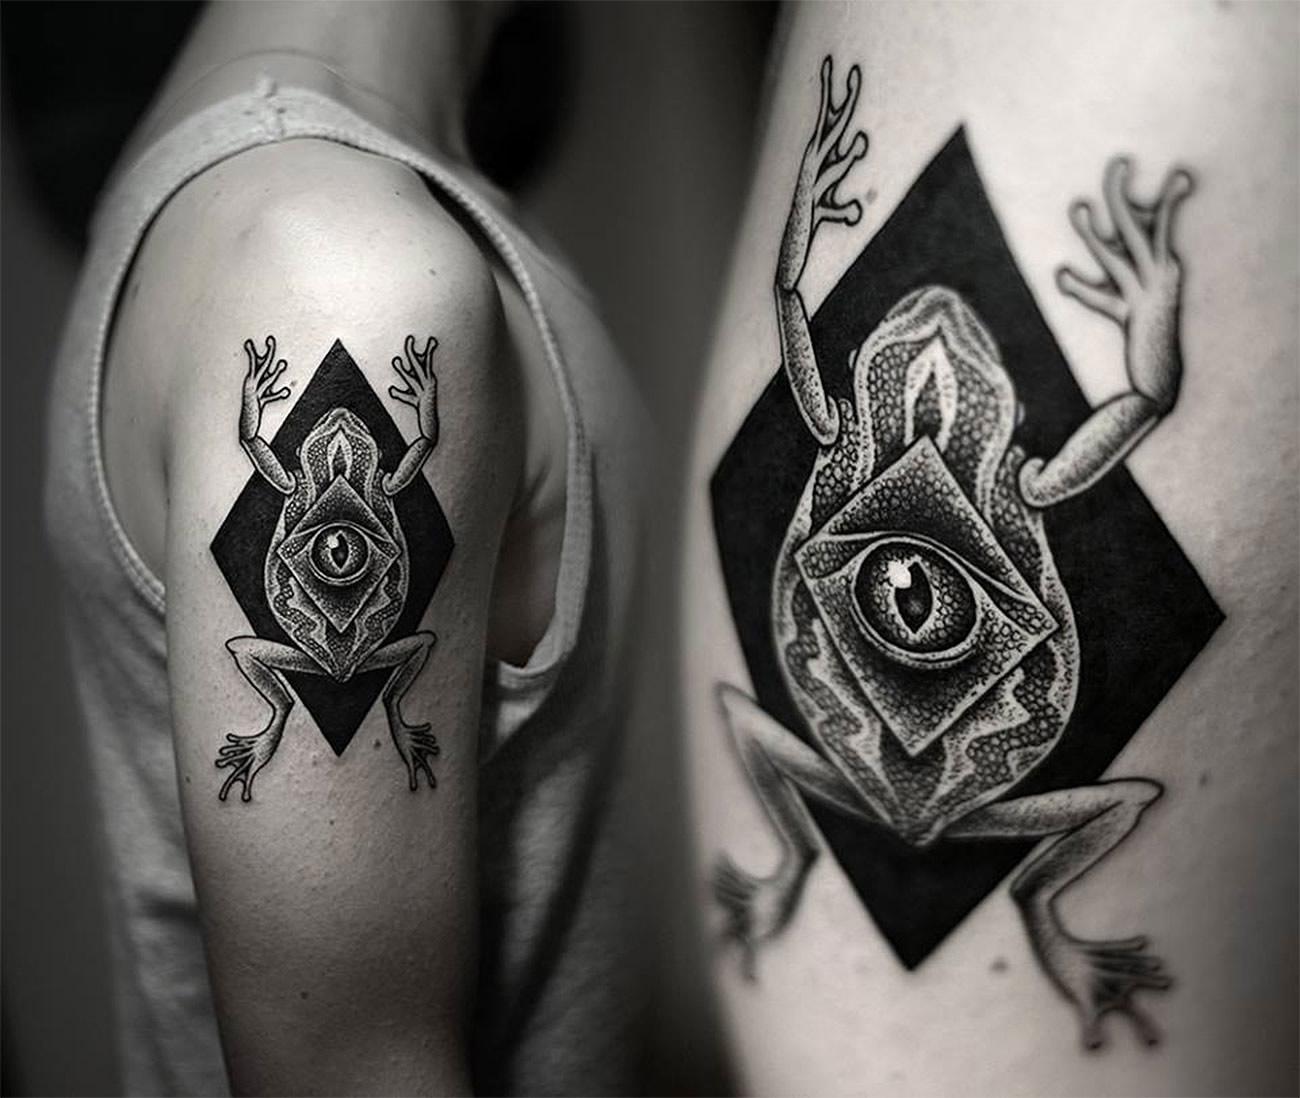 More Rad Tattoos by Kamil Czapiga